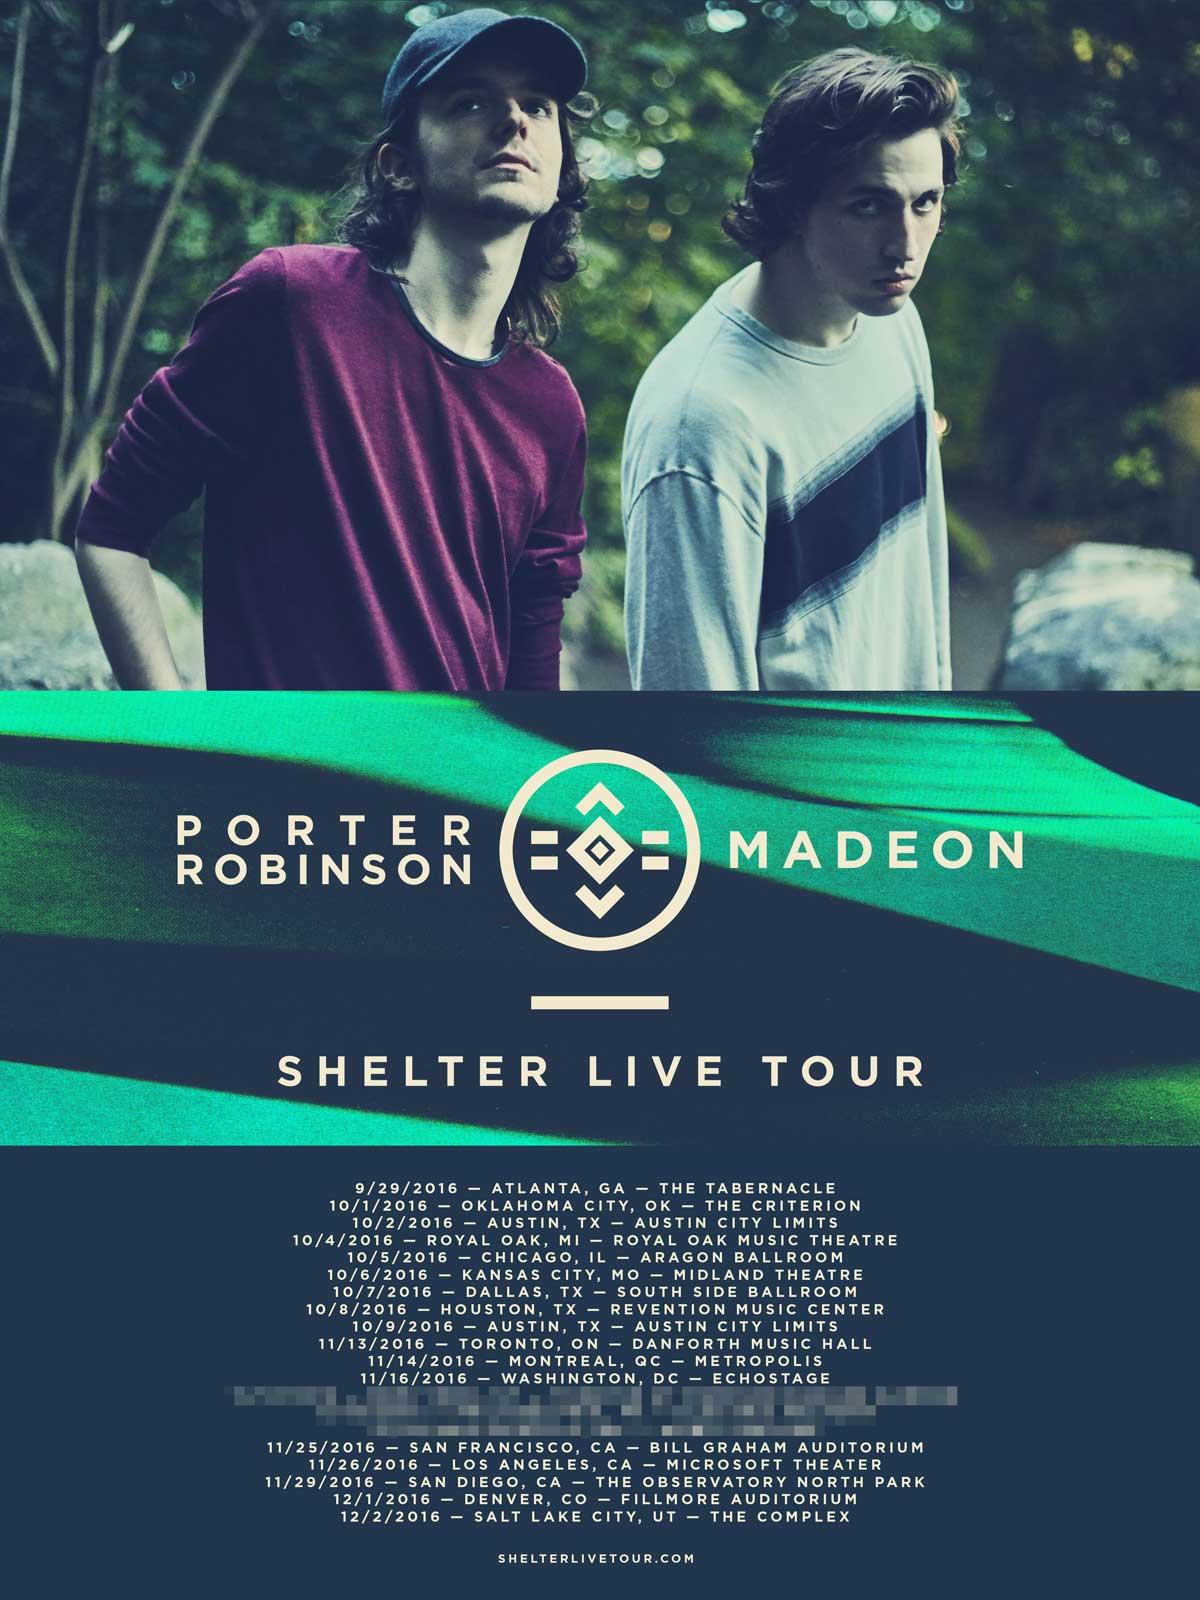 porter-robinson-madeon-shelter-tour